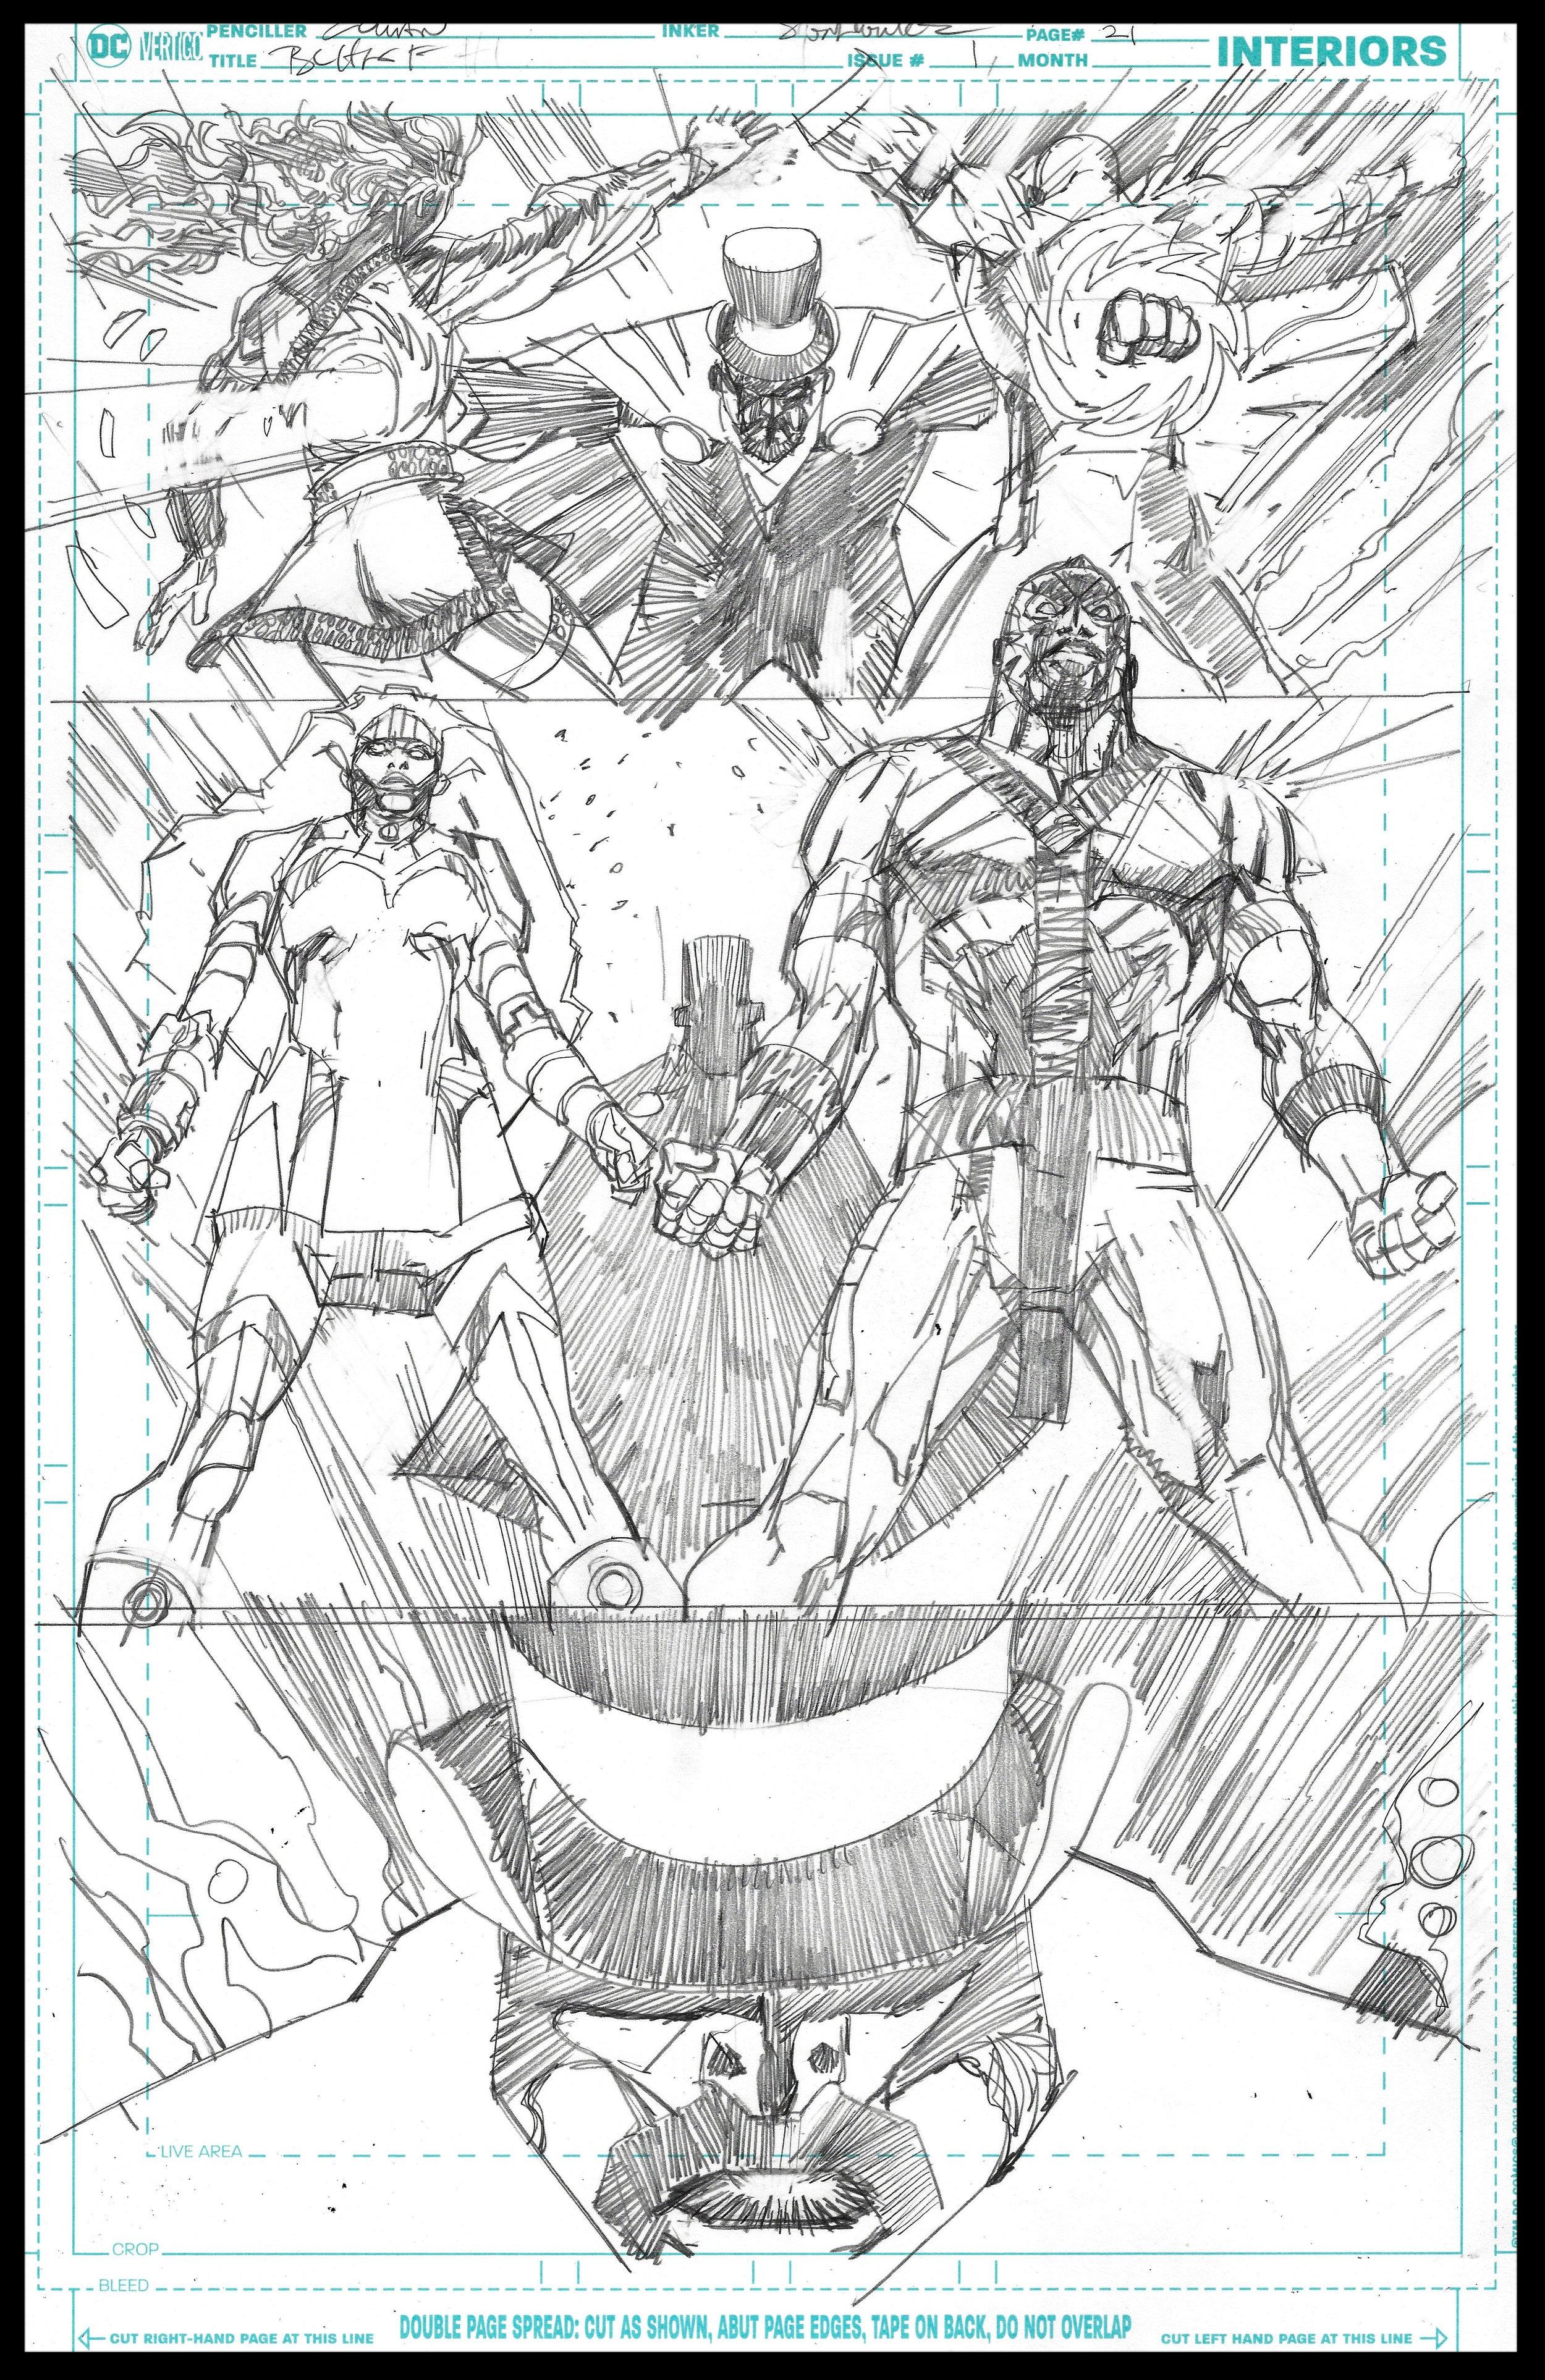 Black Lightning-Hong Kong Phooey #1 - Page 21 - Pencils